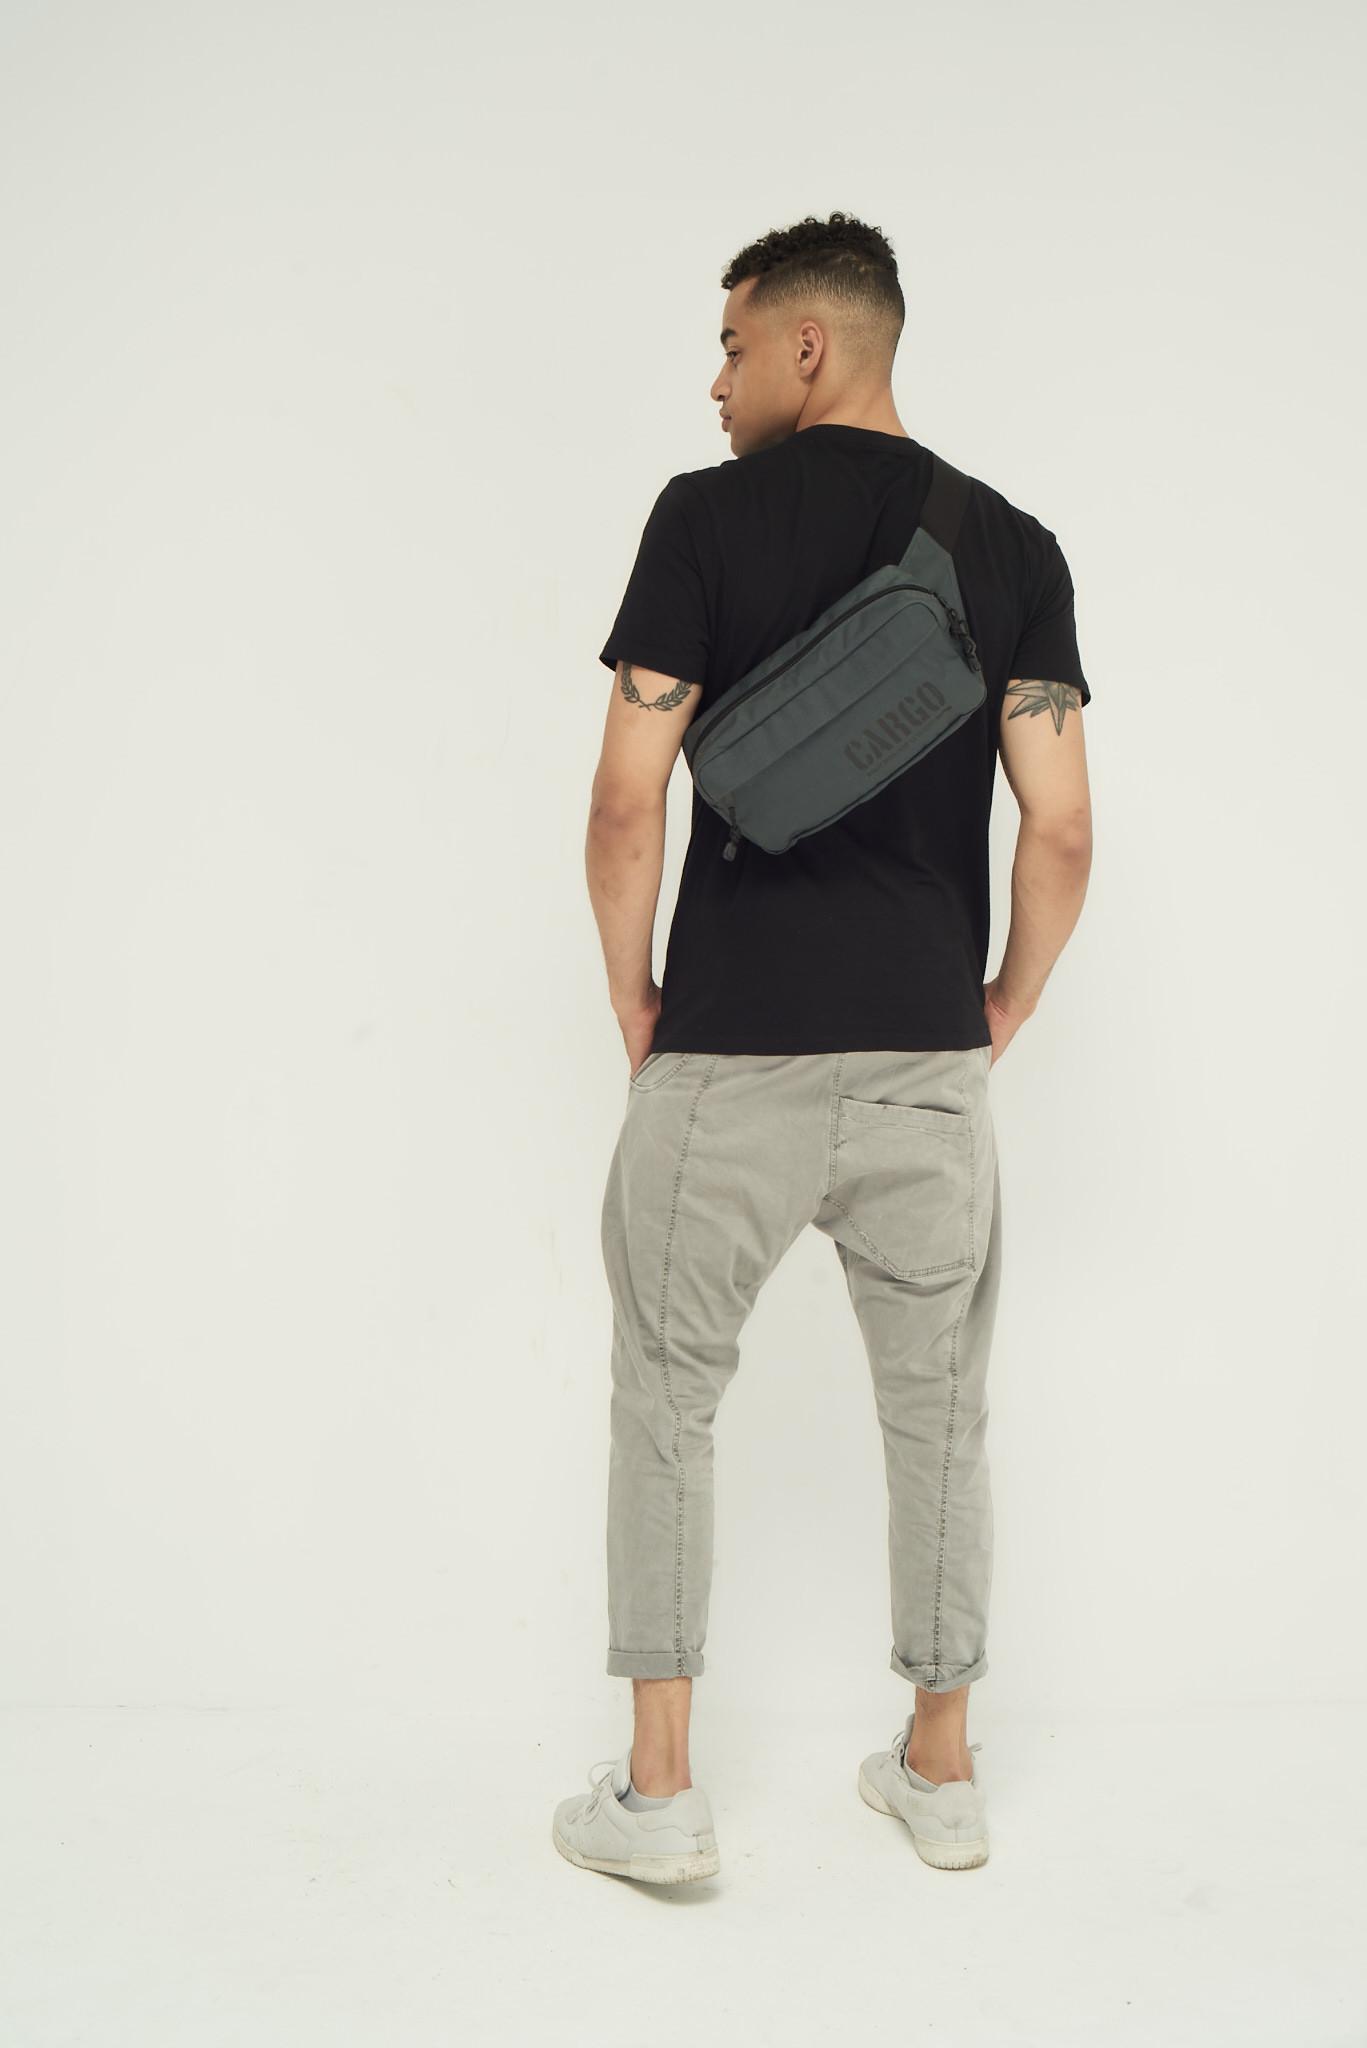 Nerka / Plecak - CARGO by OWEE